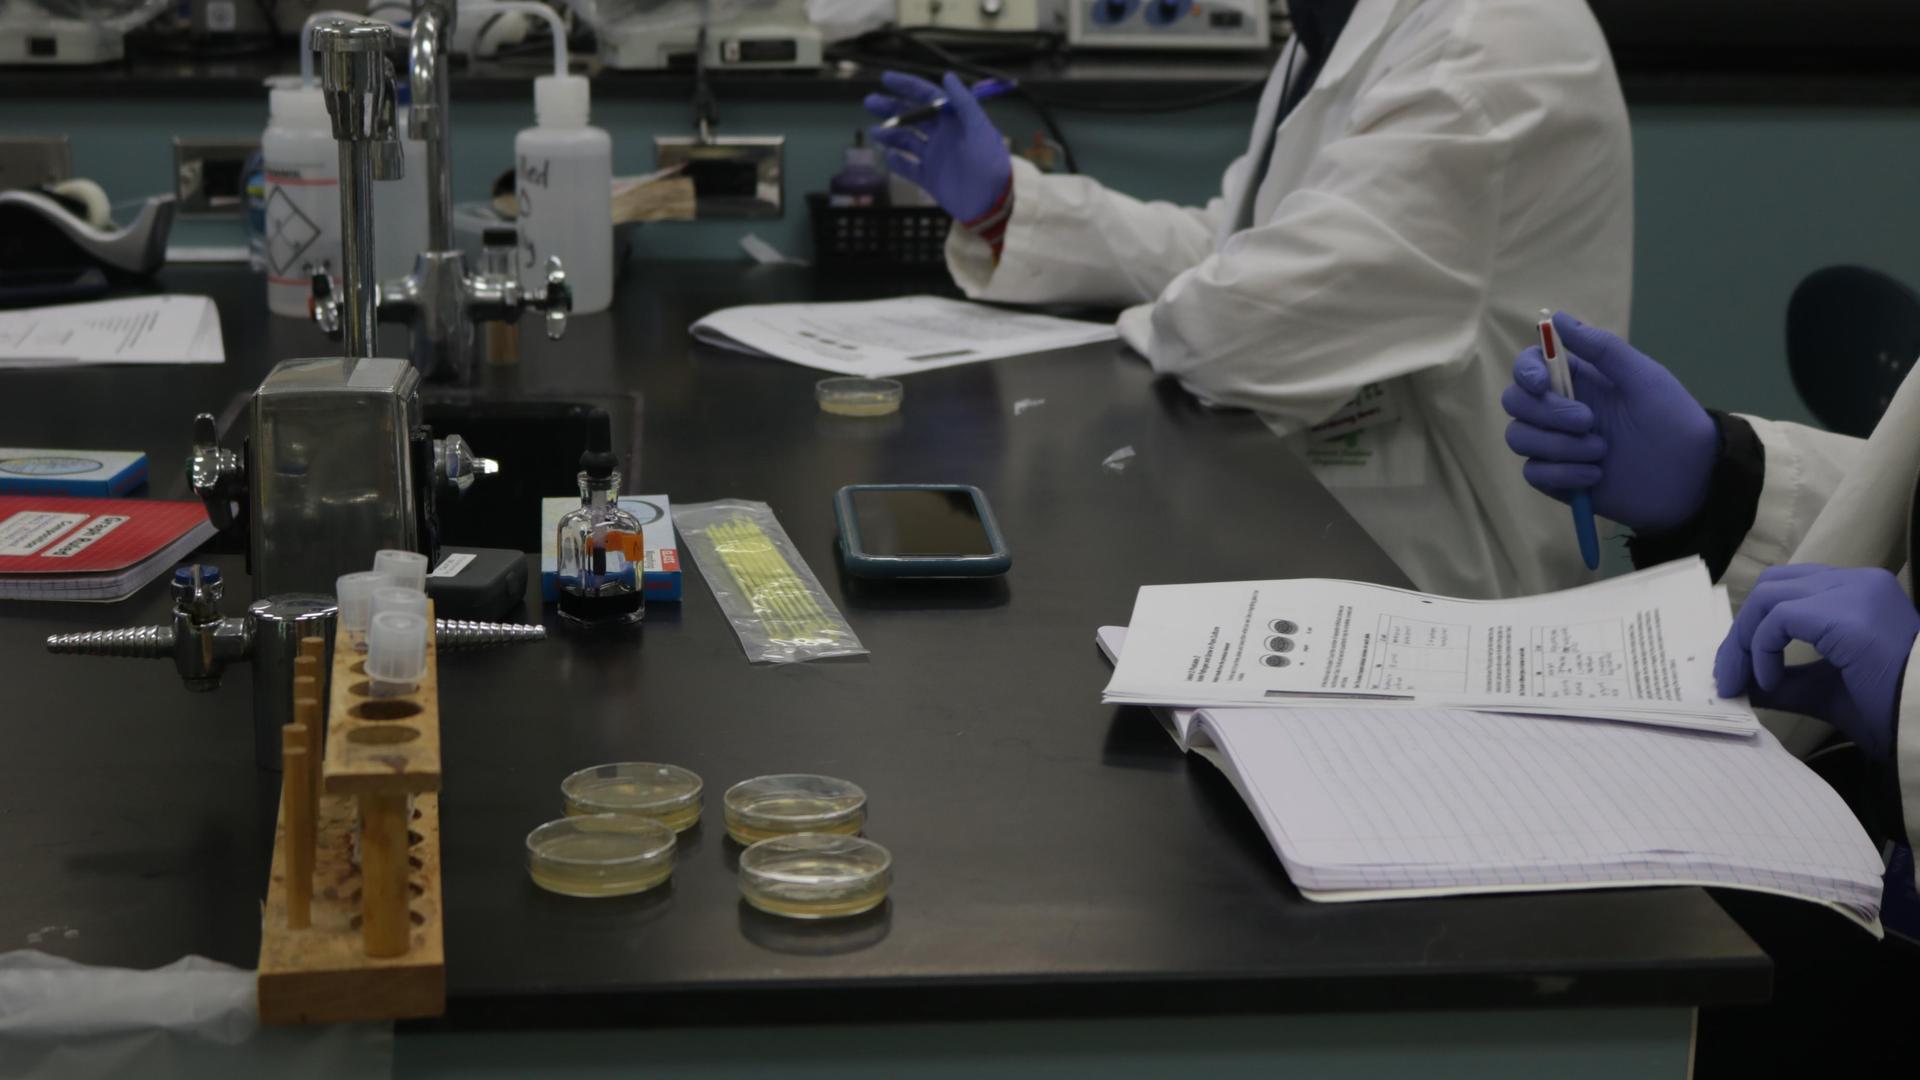 Classwork on lab table